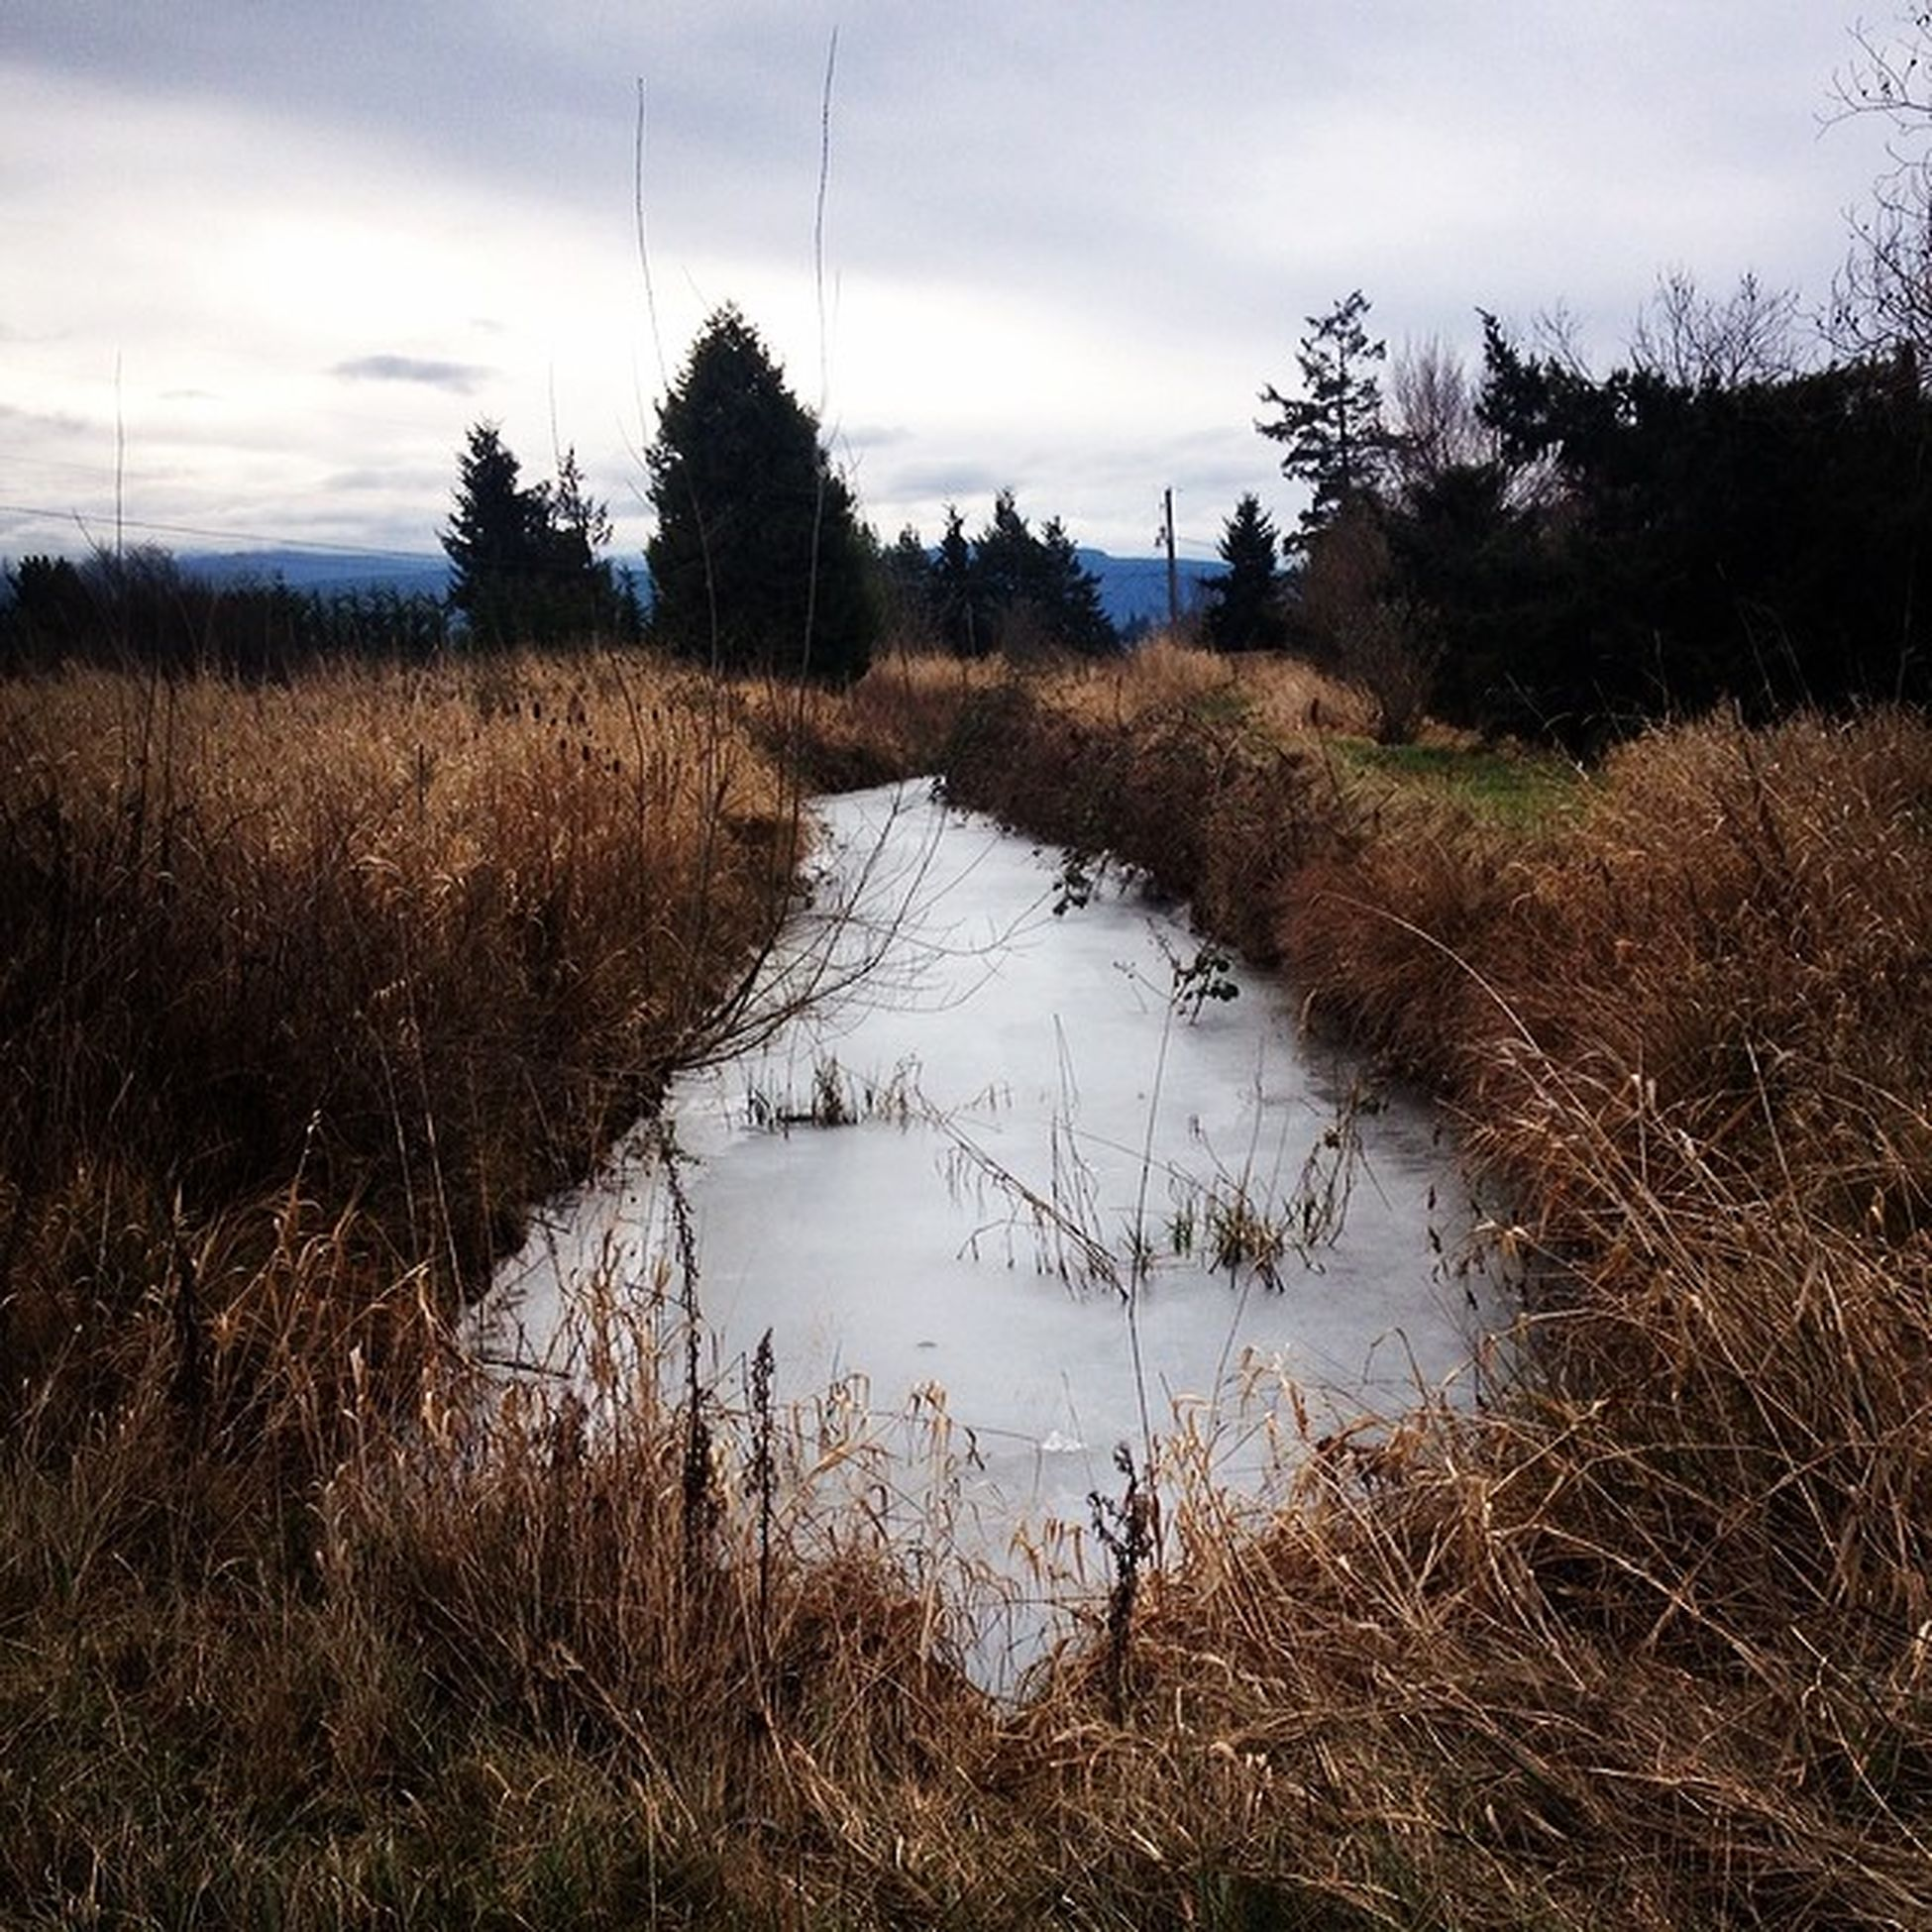 ❤️ Frozencreek Beautiful Home PNW washington iloveithere overcast beauty